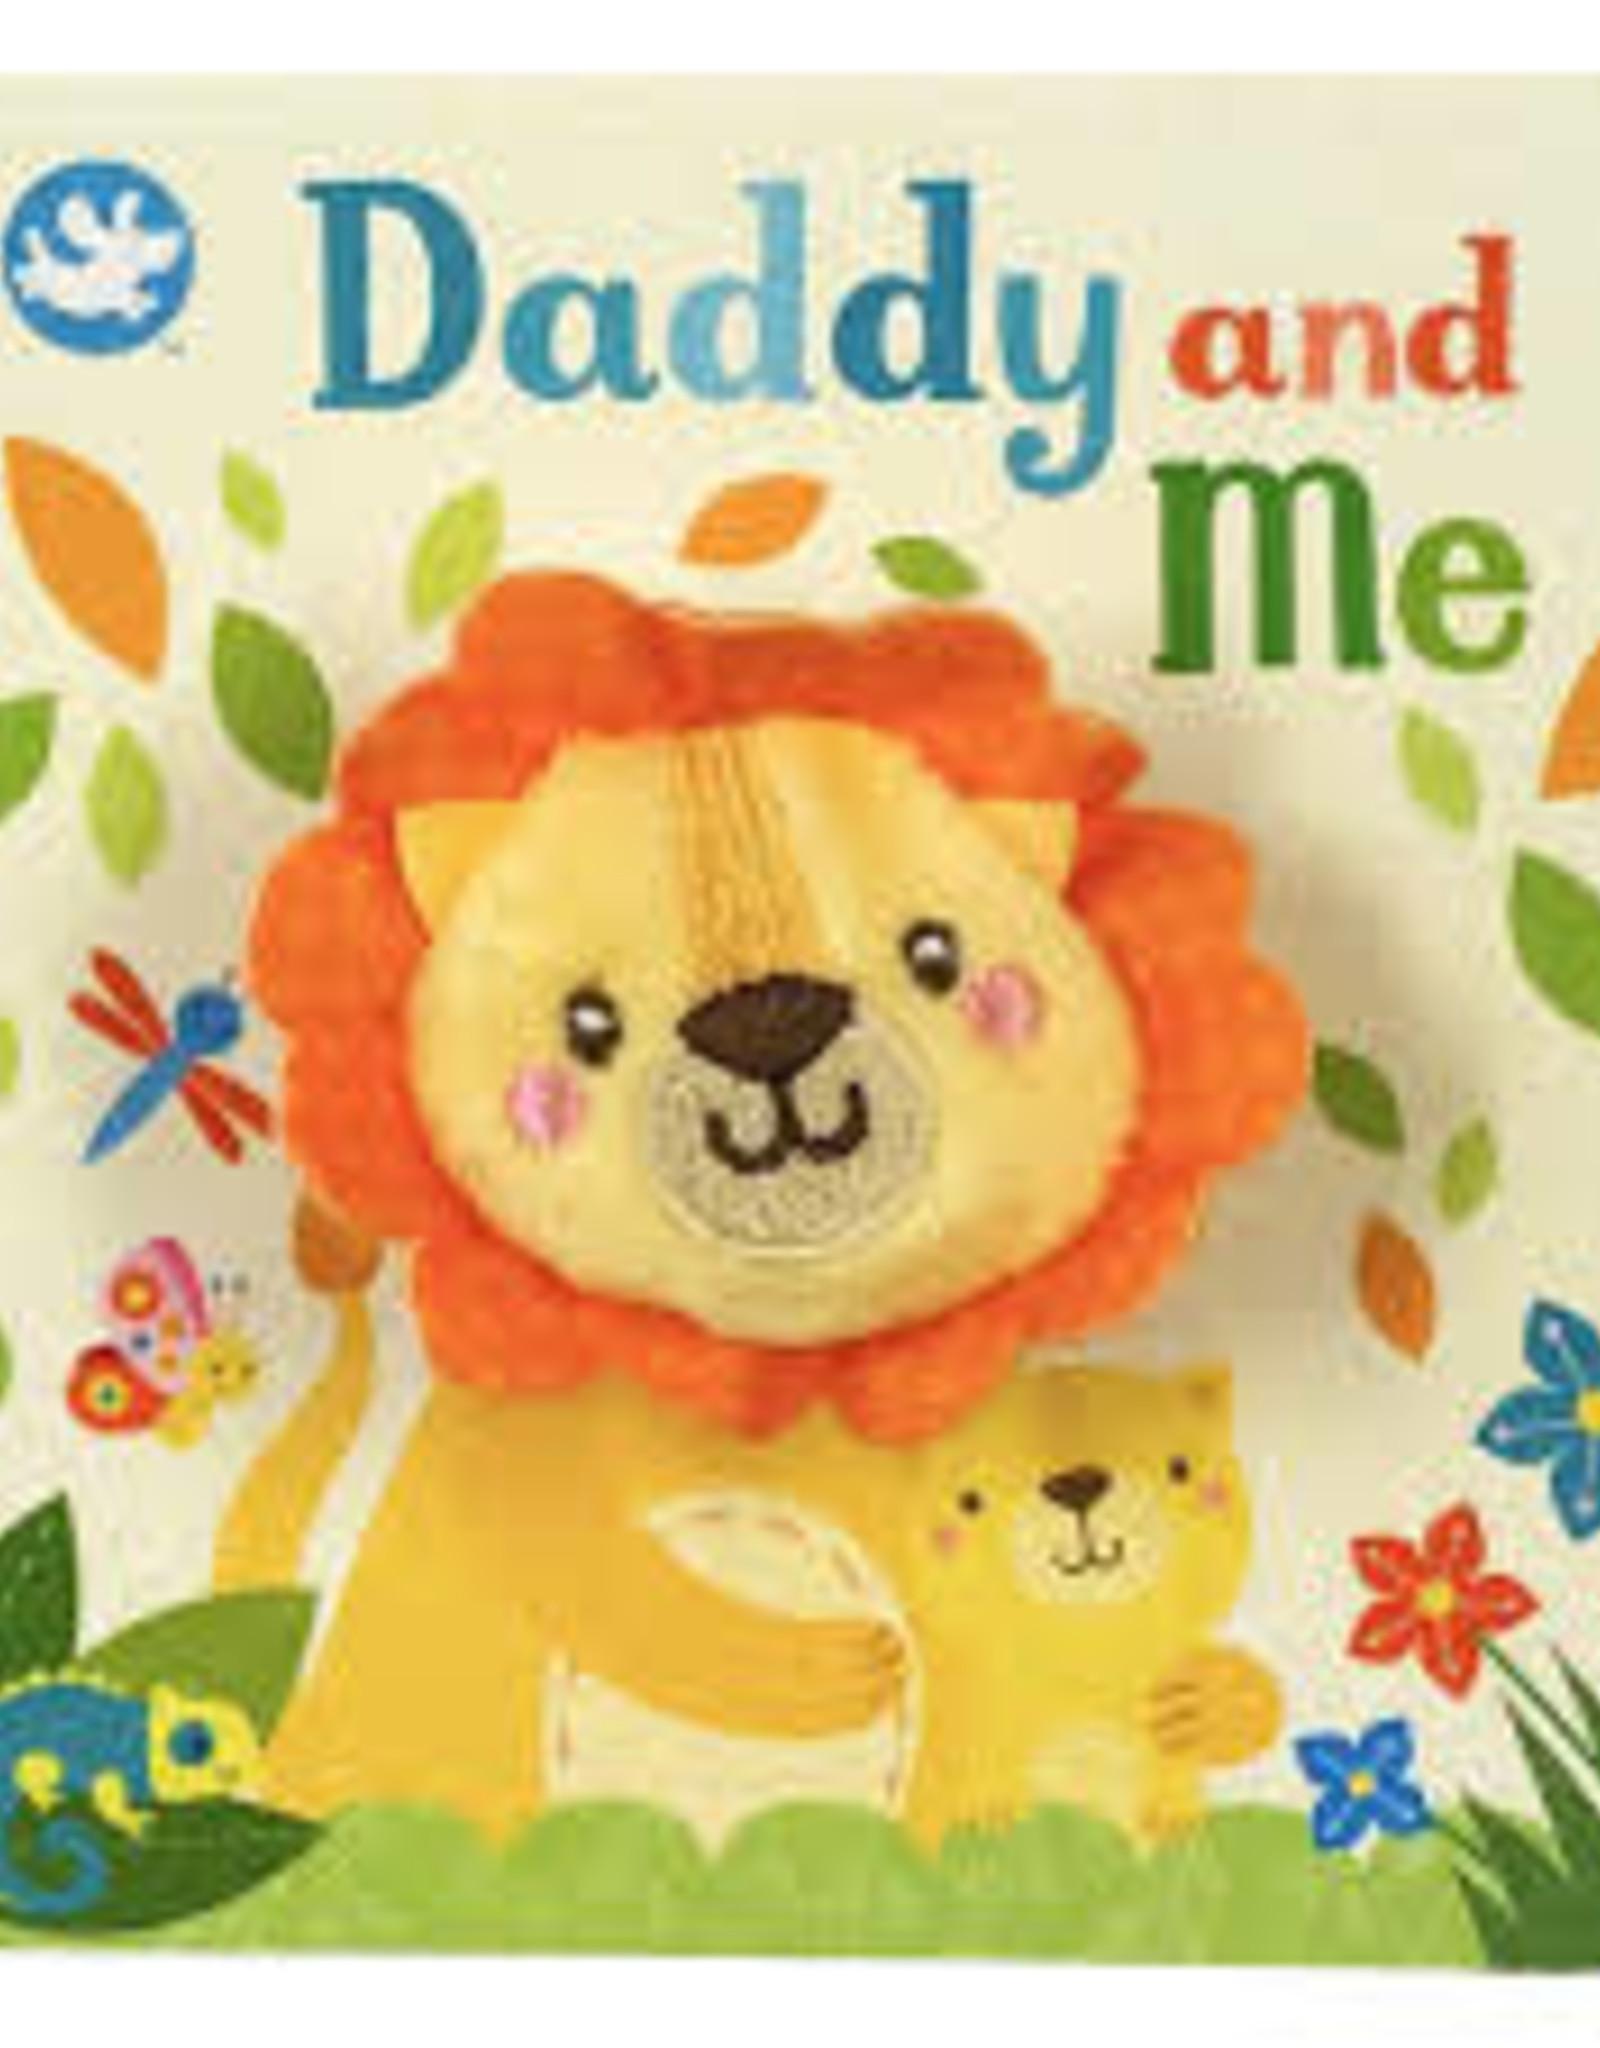 Daddy & Me board book